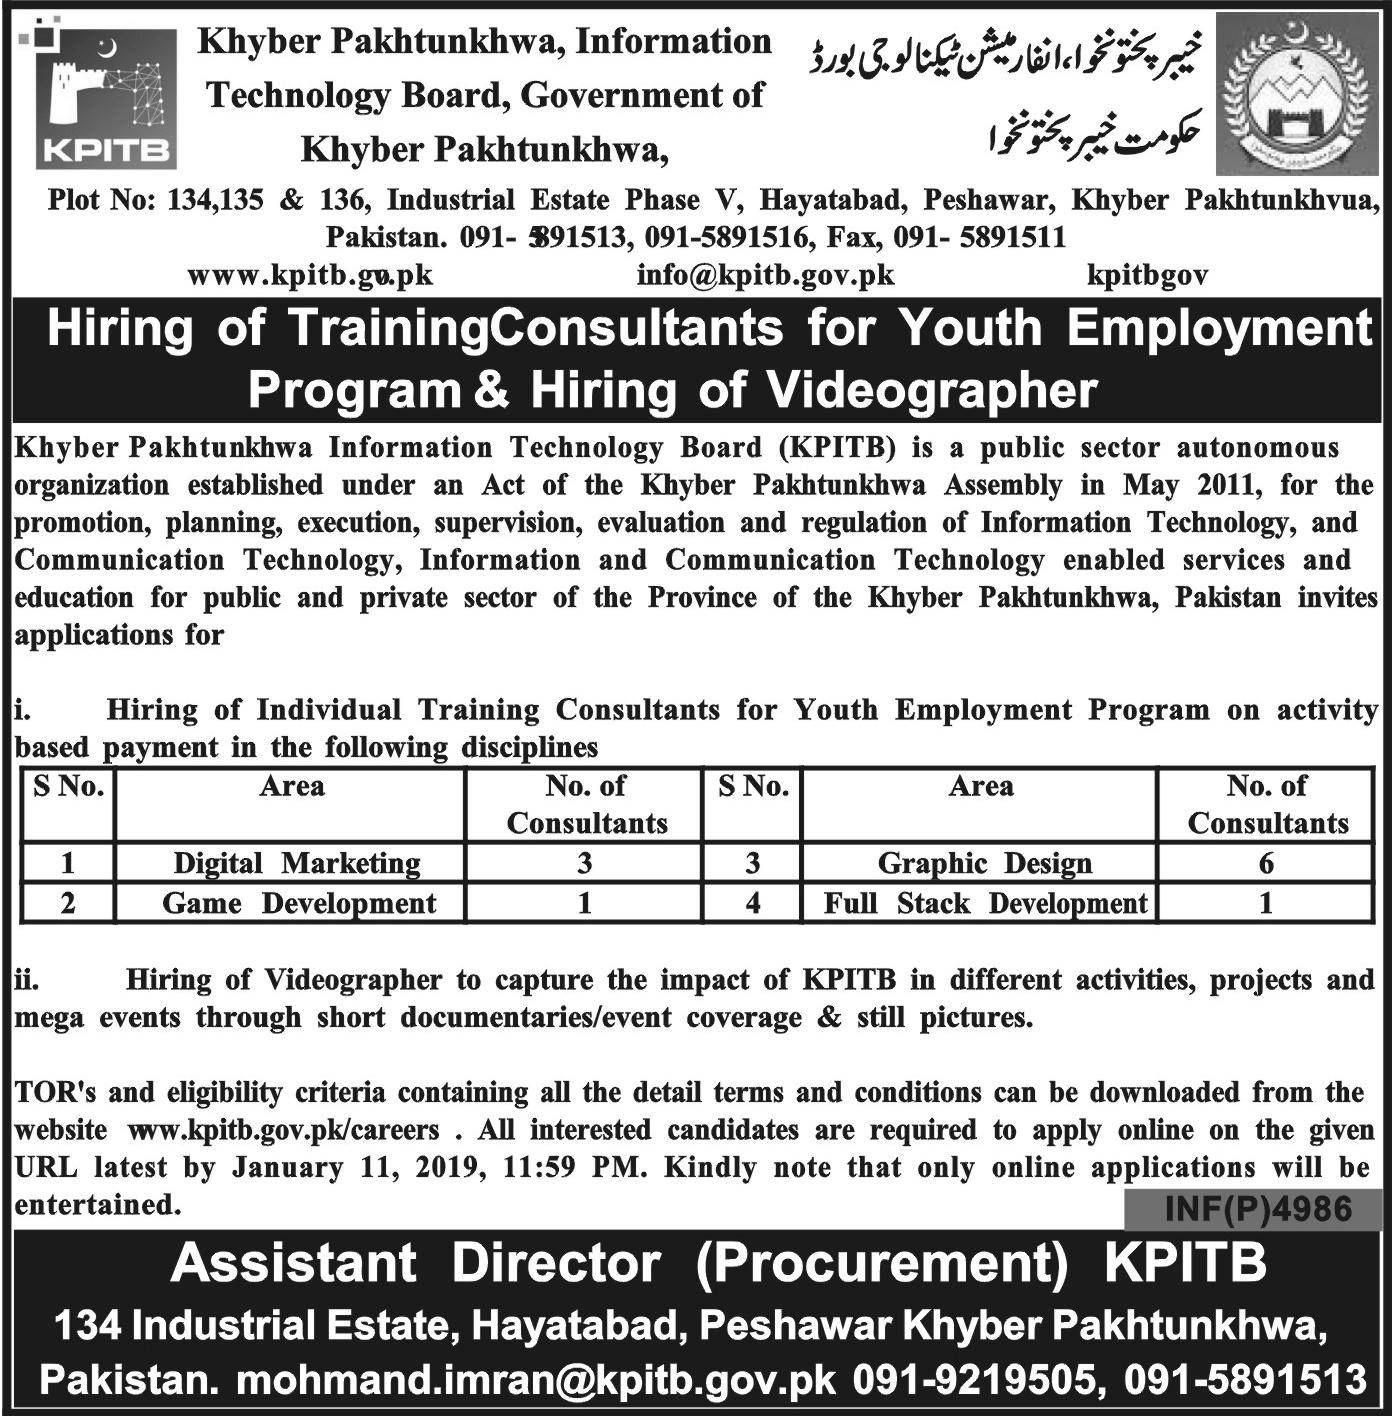 Khyber Pakhtunkhwa Information Technology Board 29 Dec 2018                                     Jobs